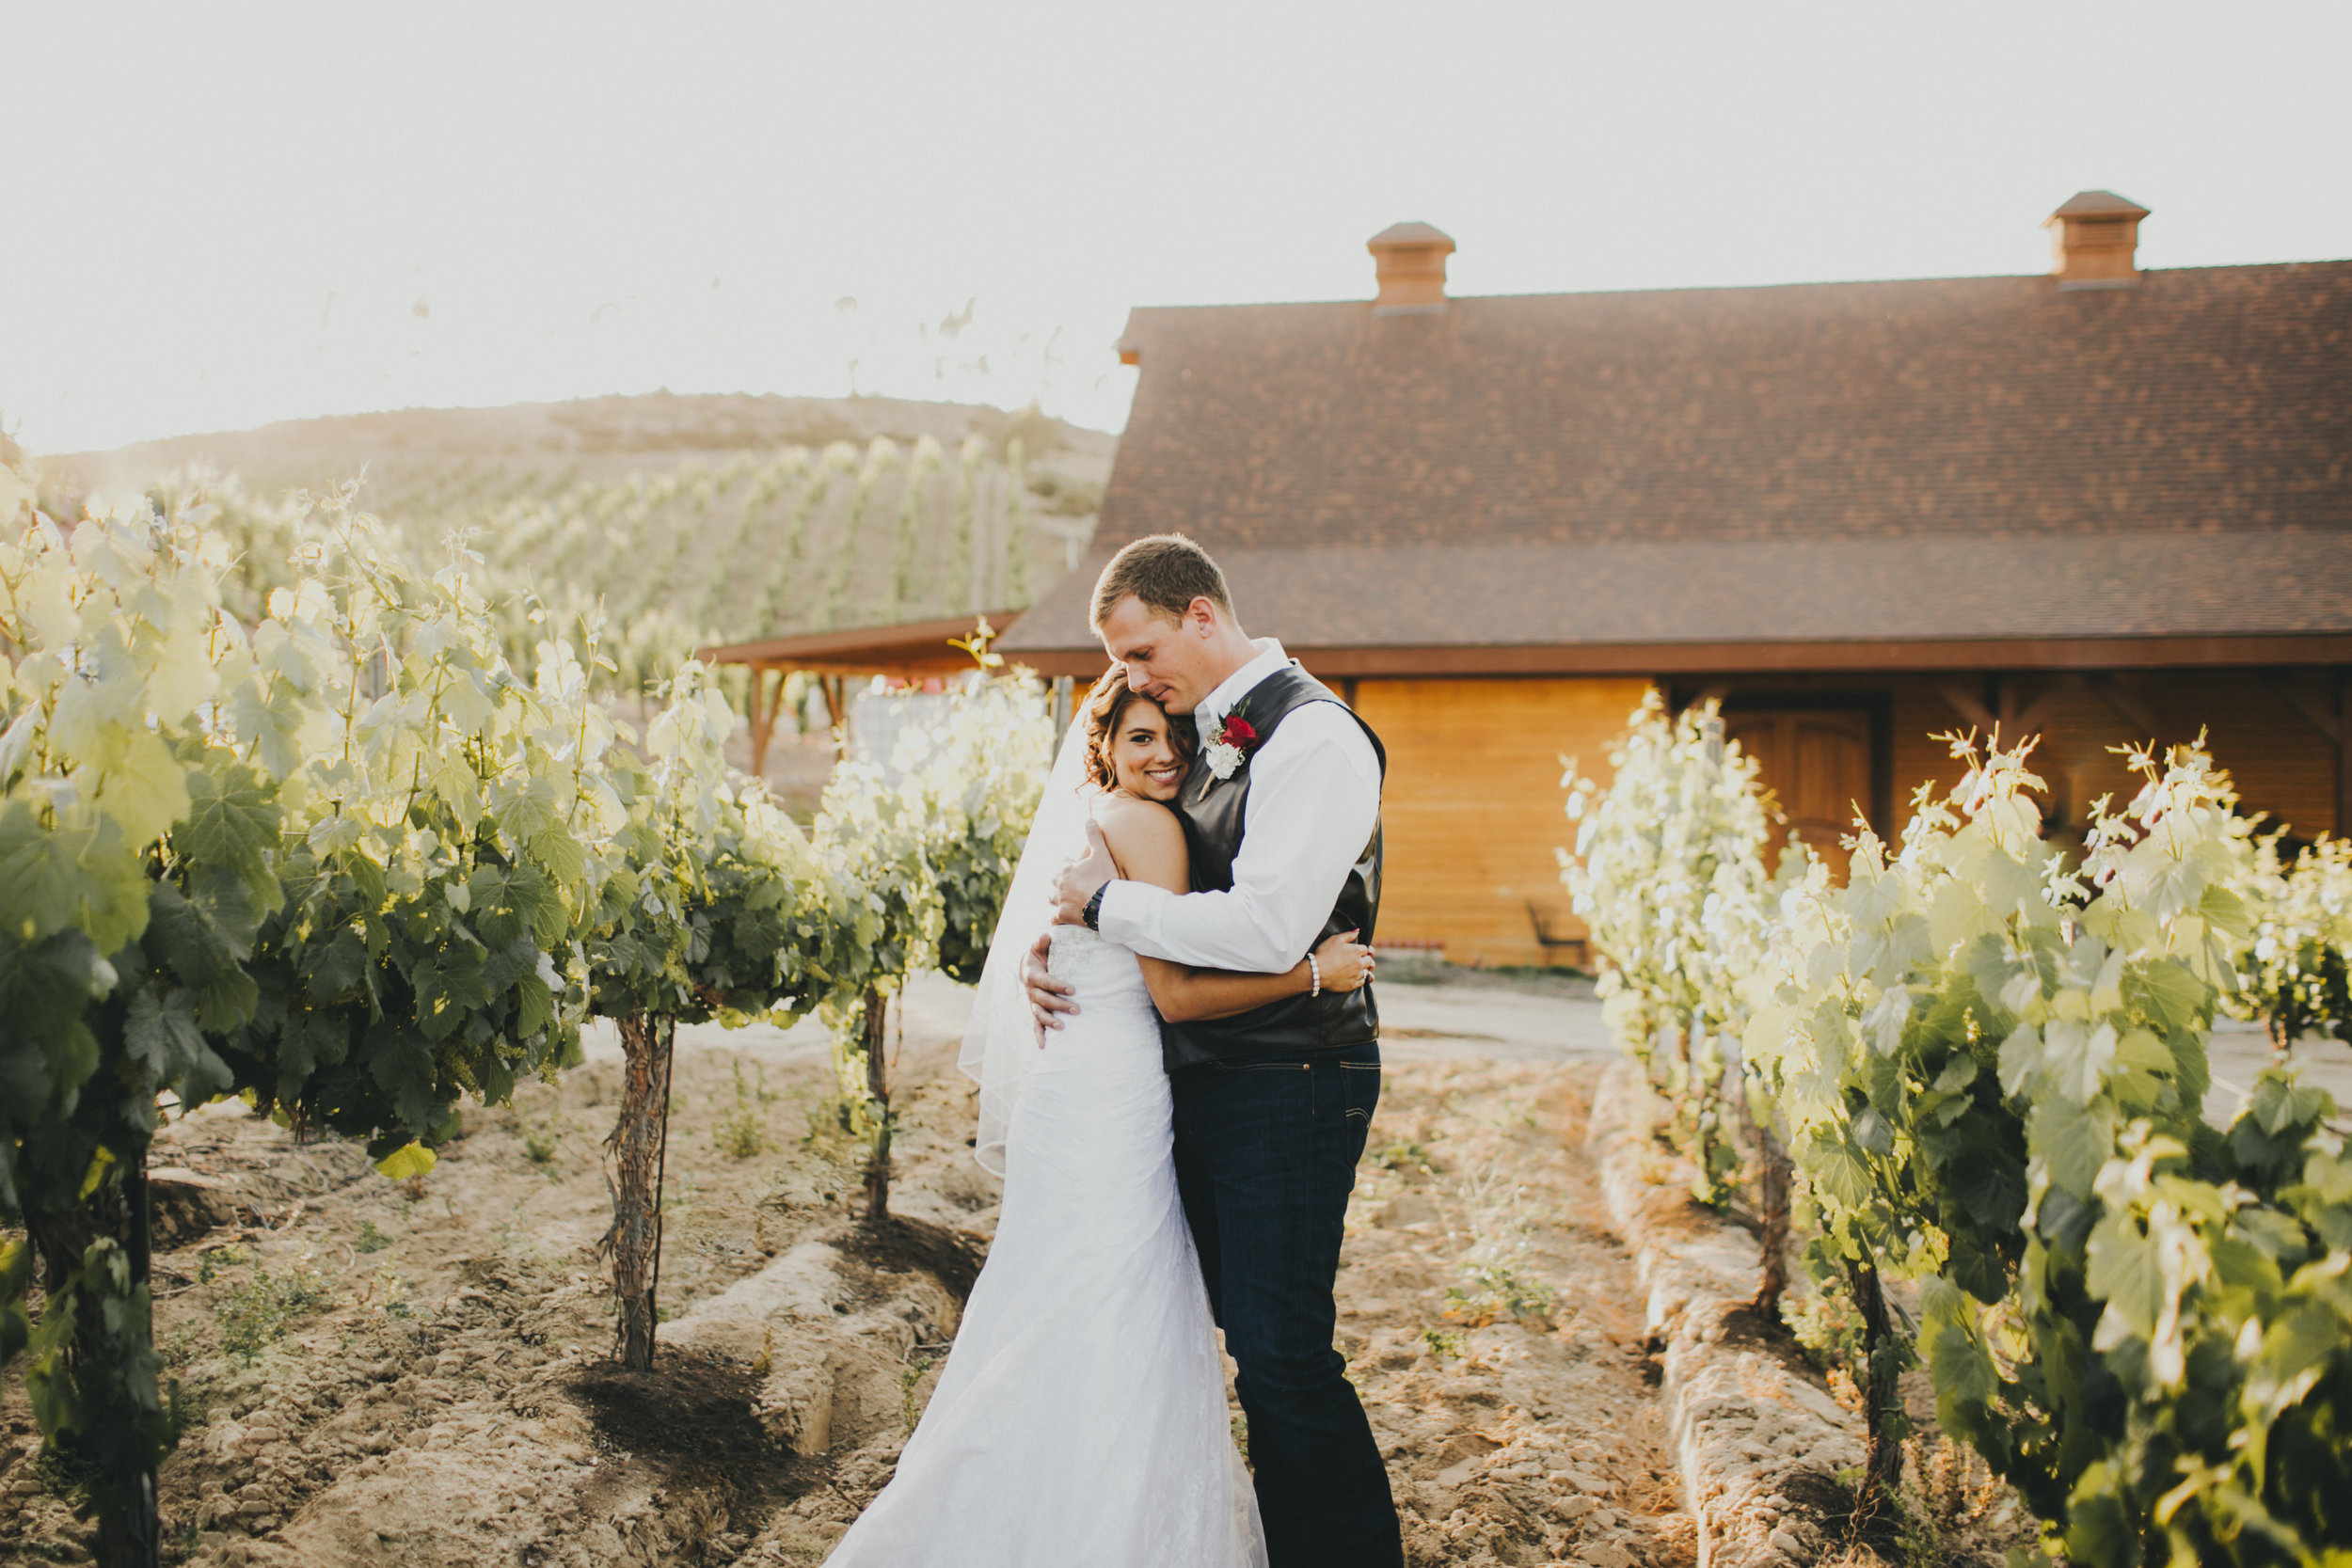 Cheyenne + Jordan - Wedding, Natalie Griffo (85 of 157).jpg